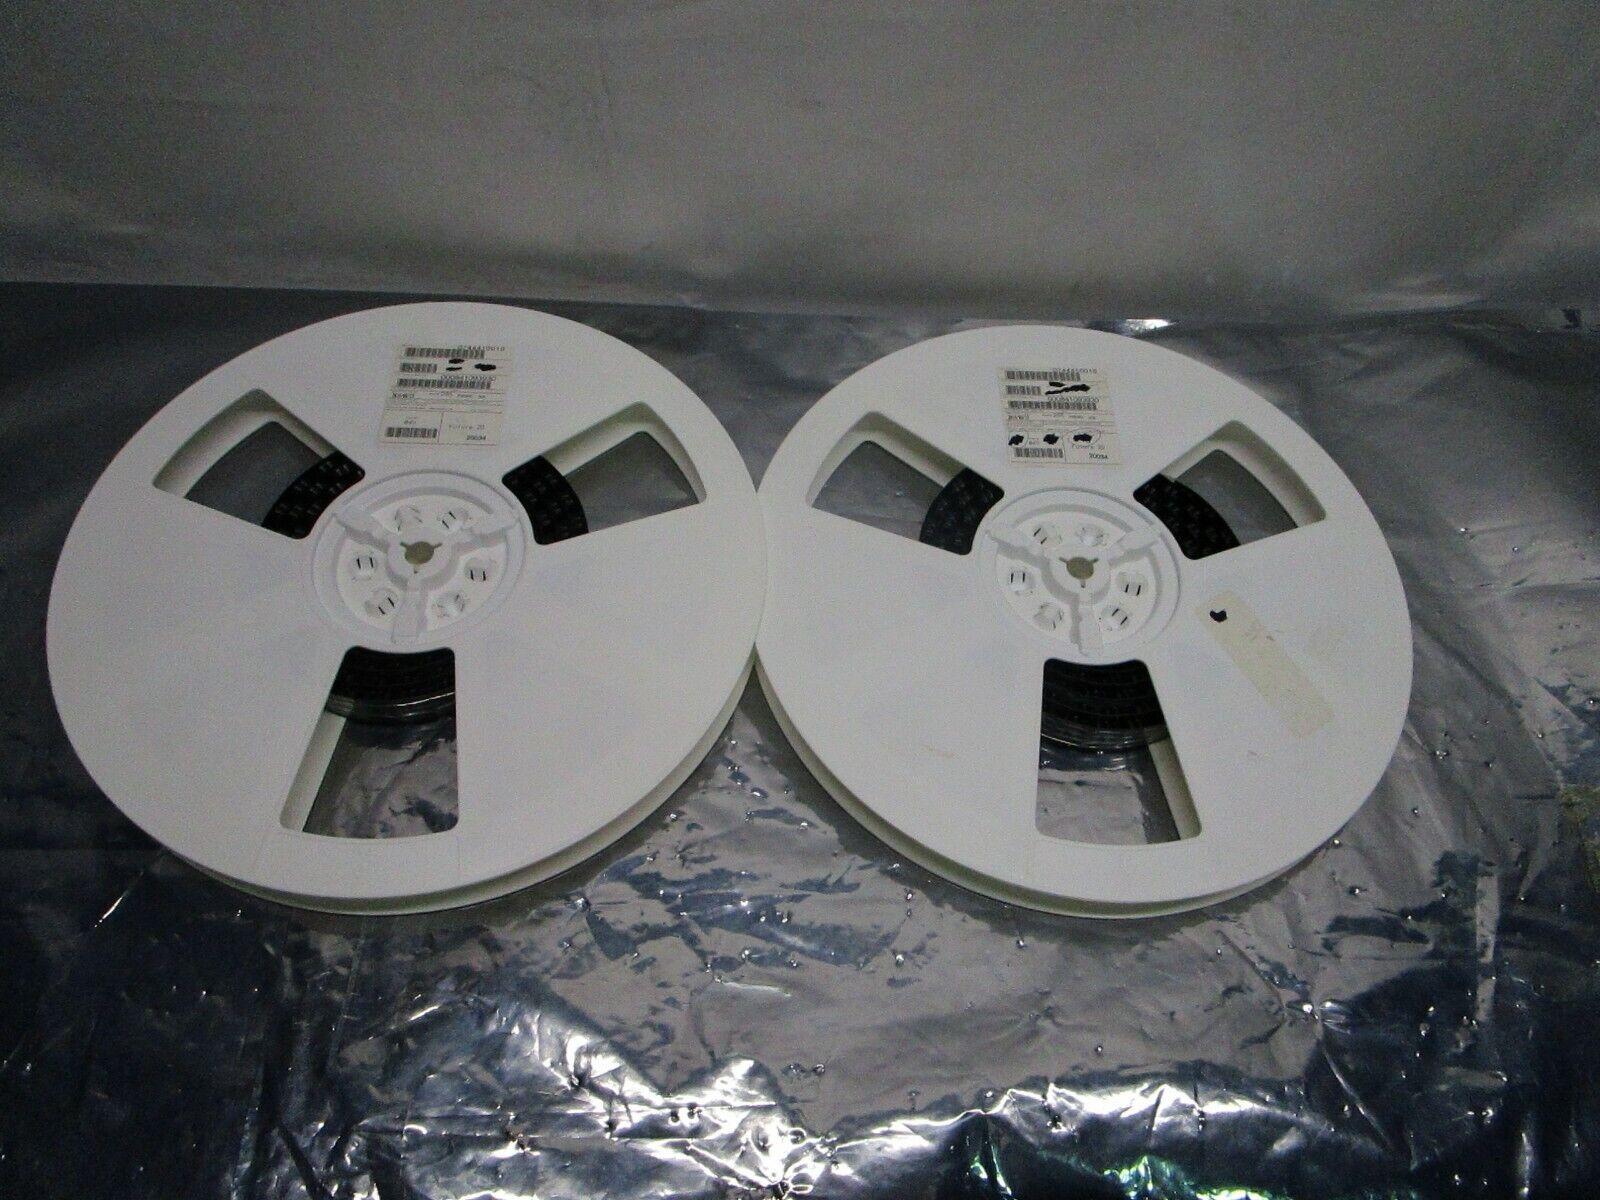 1 Lot of 185 Molex 0744410010 SFP Connector Assembly 30'''SAu 20CKt, 102709